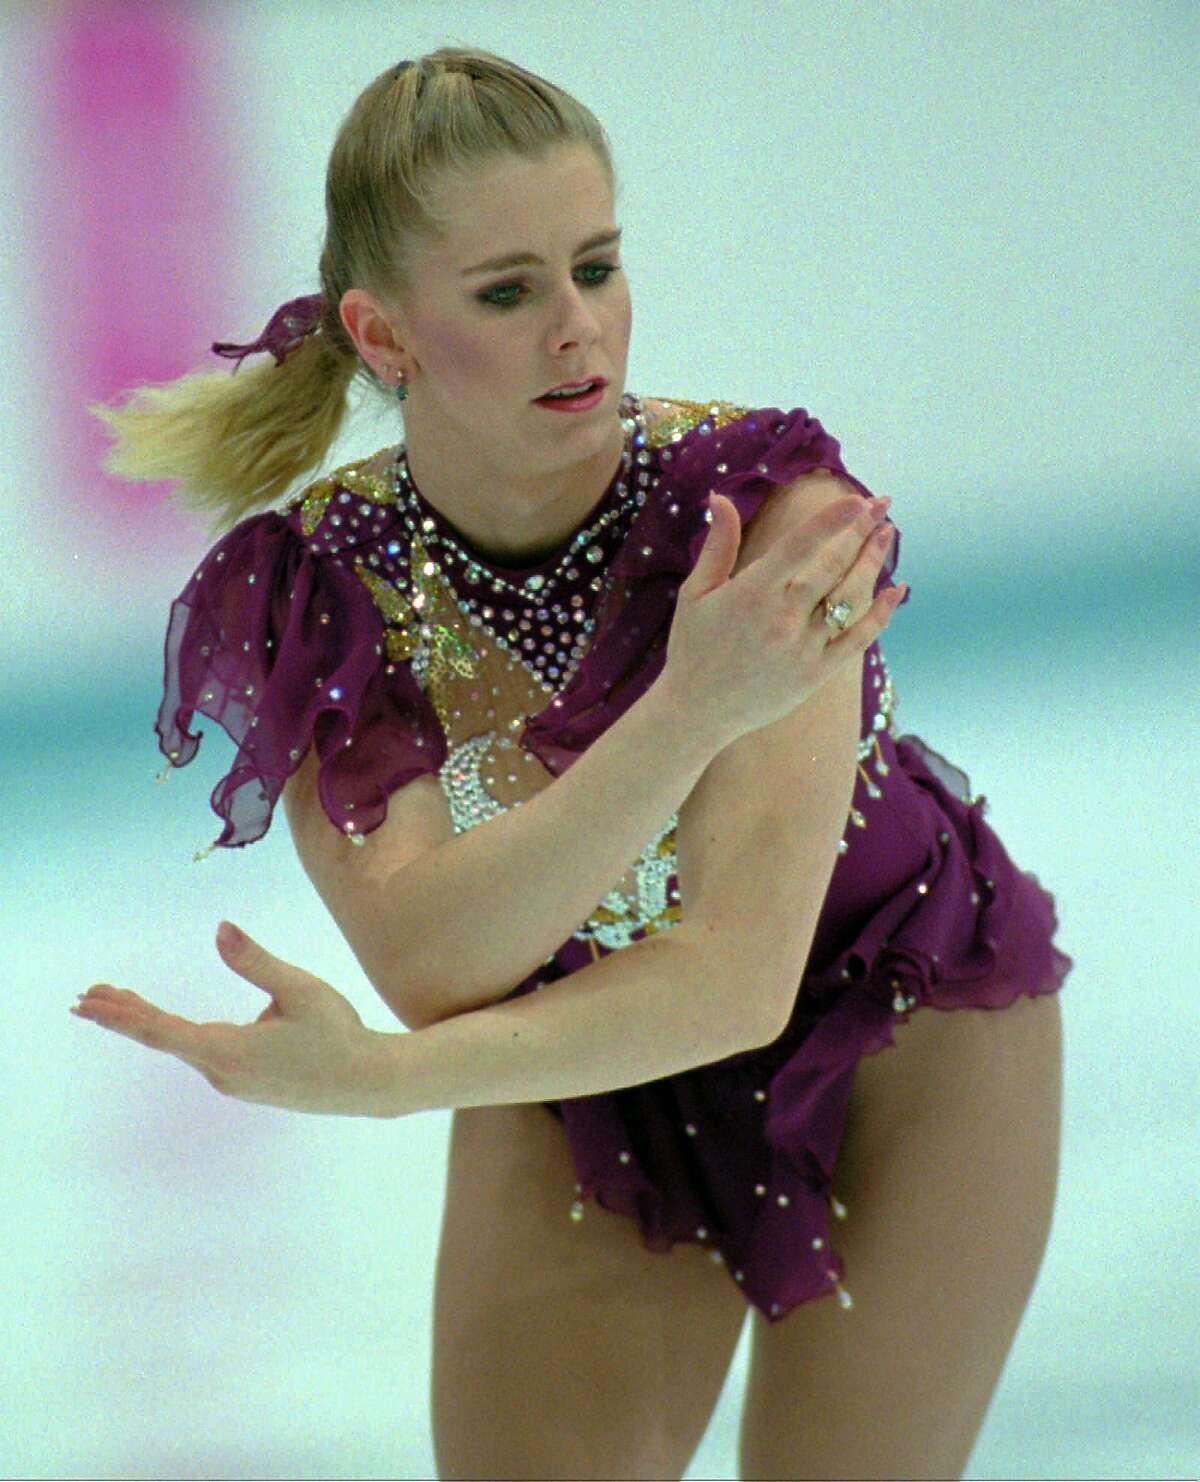 American figure skater Tonya Harding performs her free skating program Friday, Feb. 25, 1994, in Hamar, Norway.